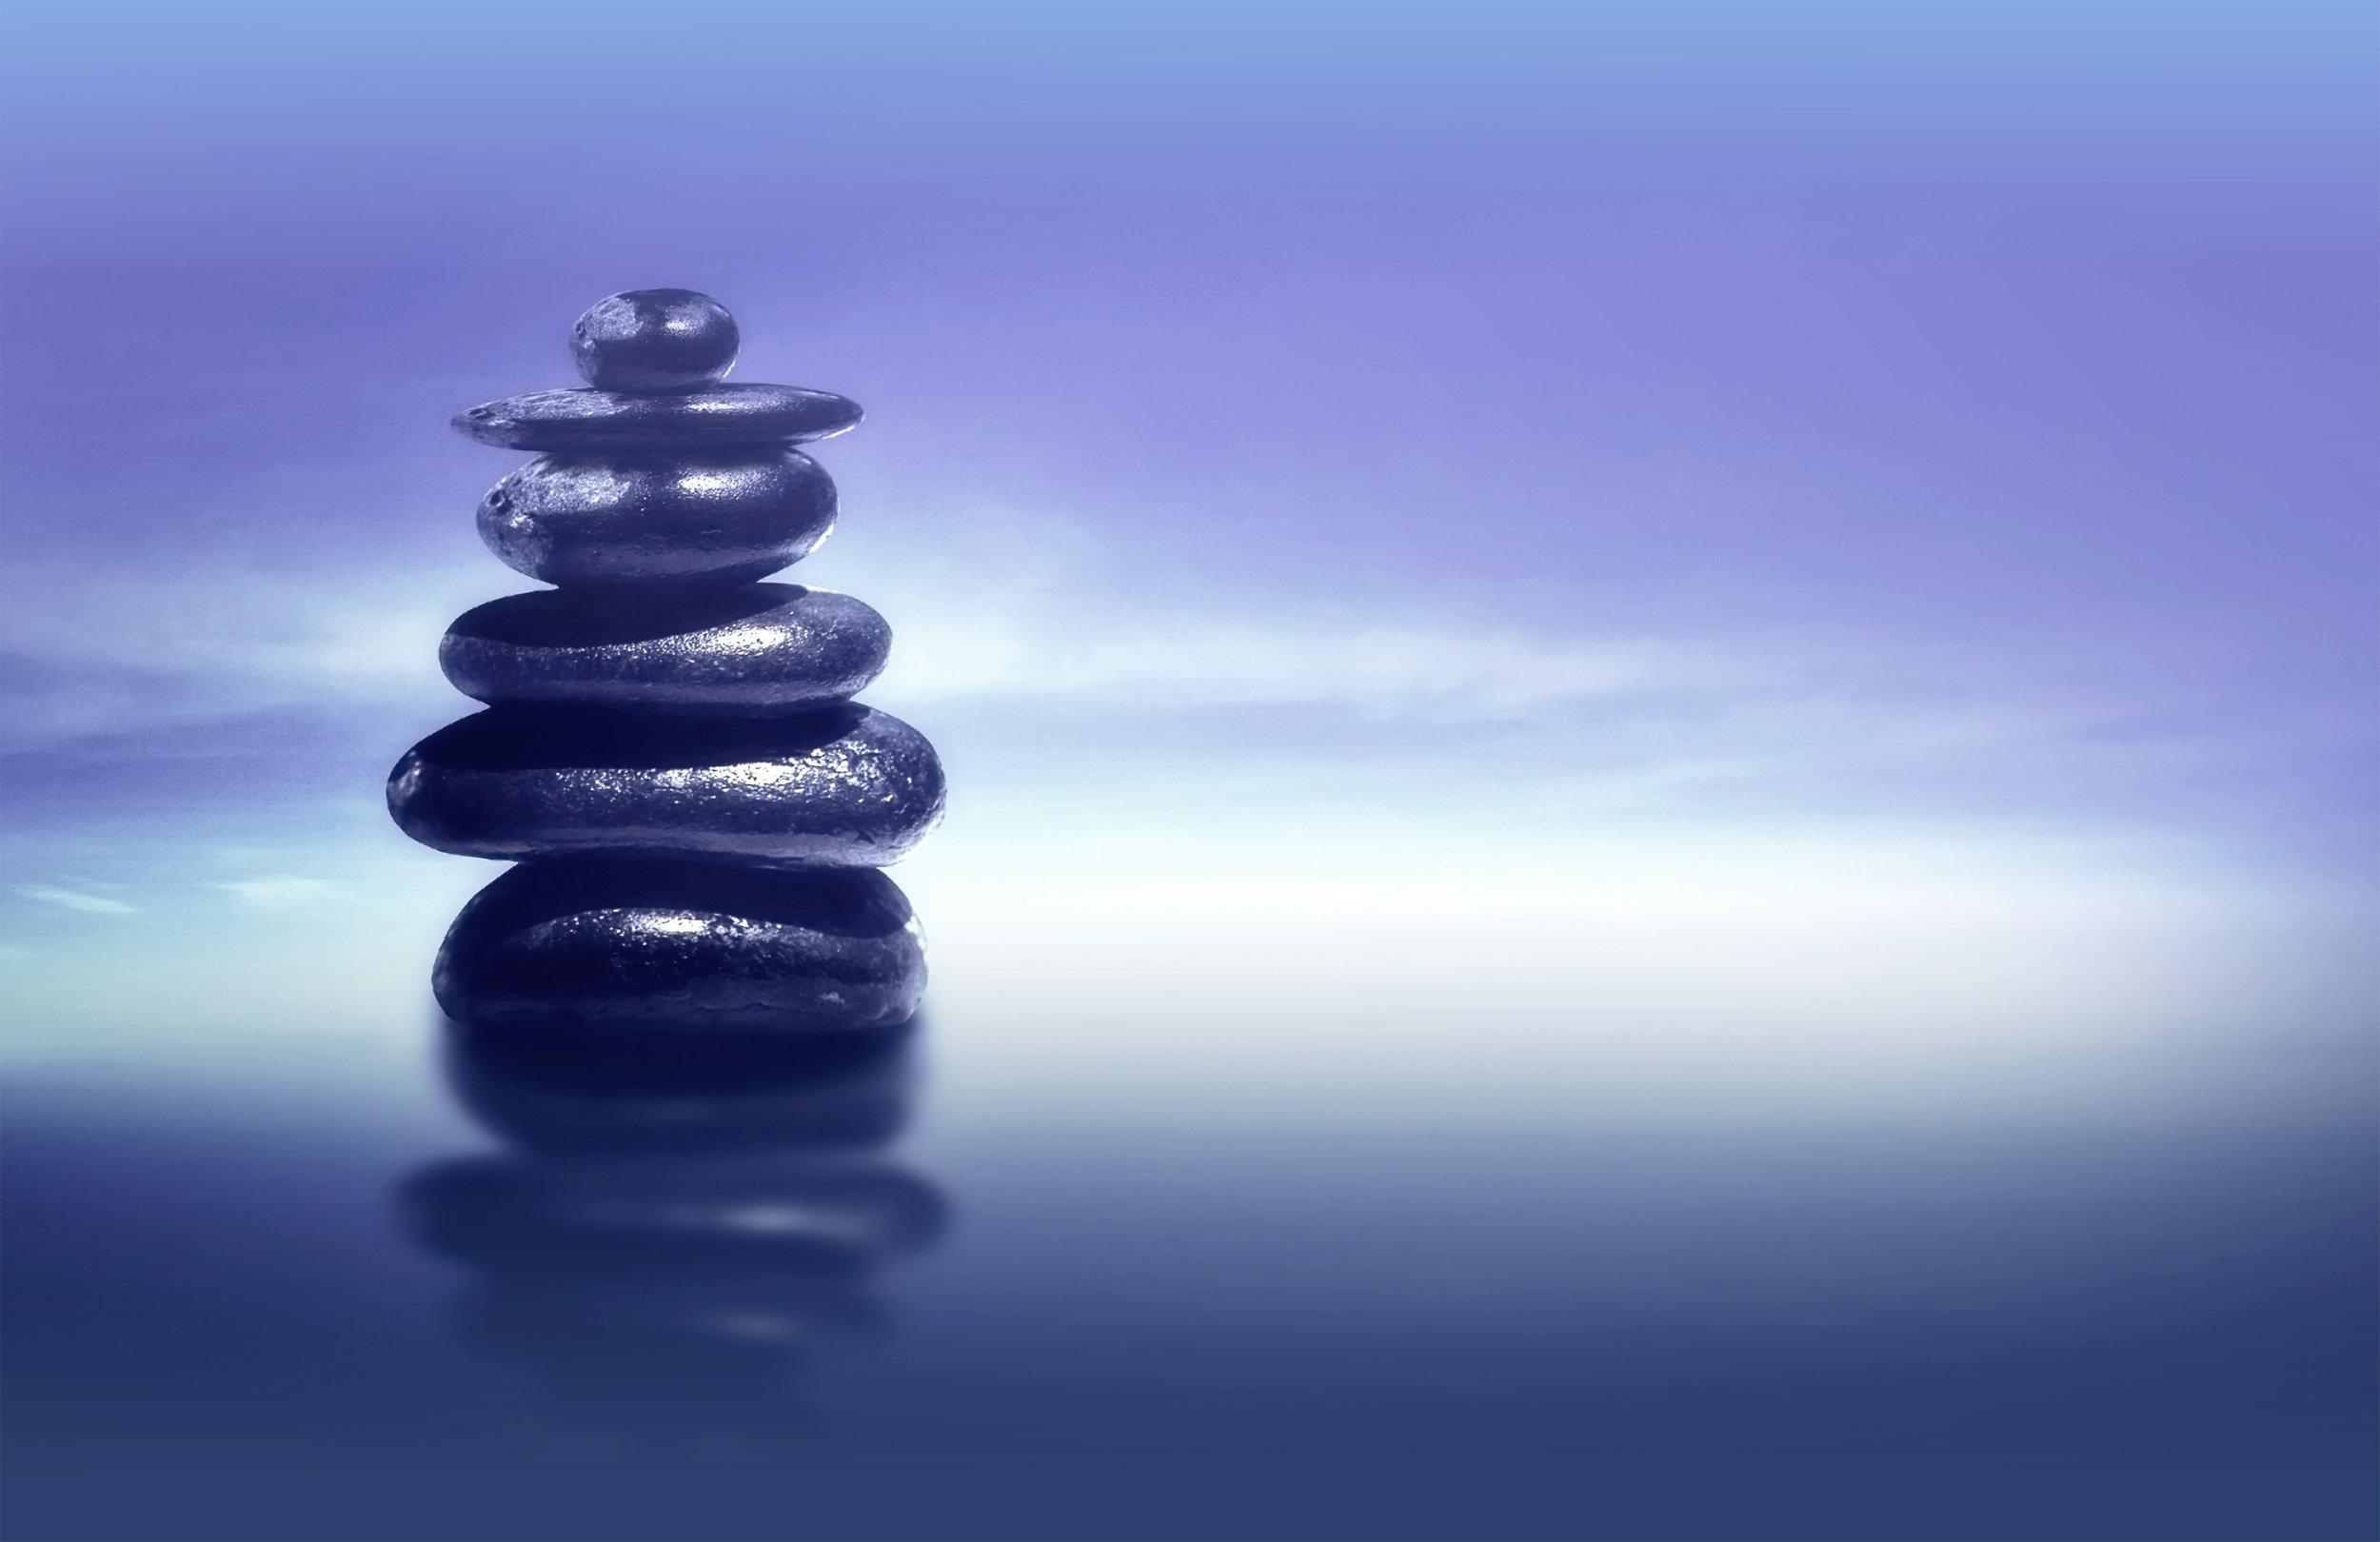 stockvault-zen-stones---feng-shui-and-harmony-concept203949.jpg